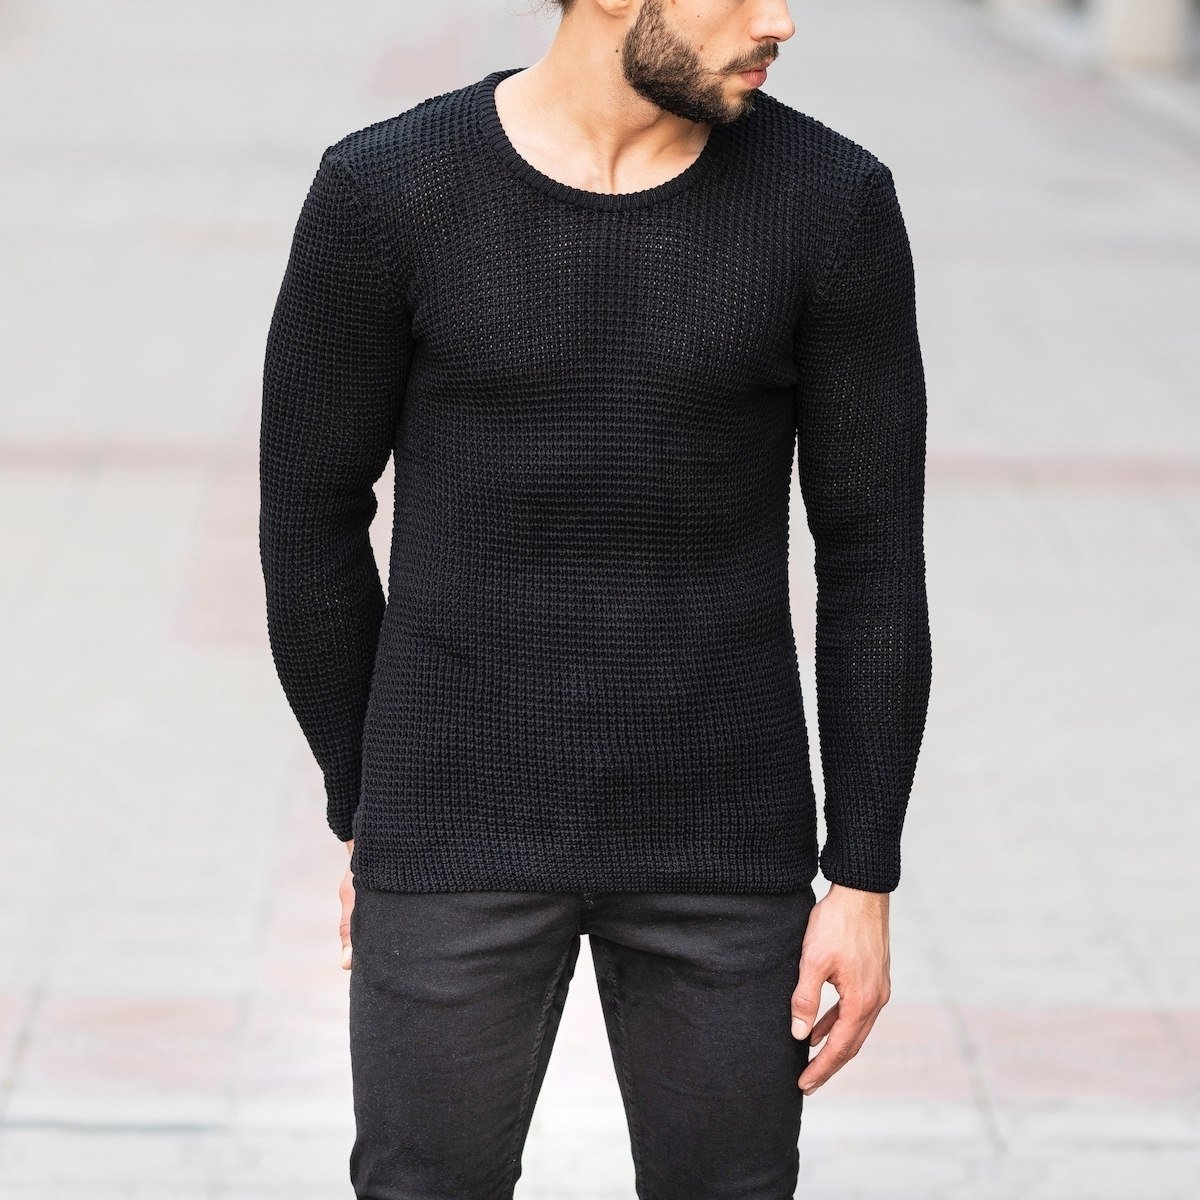 Knitted Pullover In Black Mv Premium Brand - 1